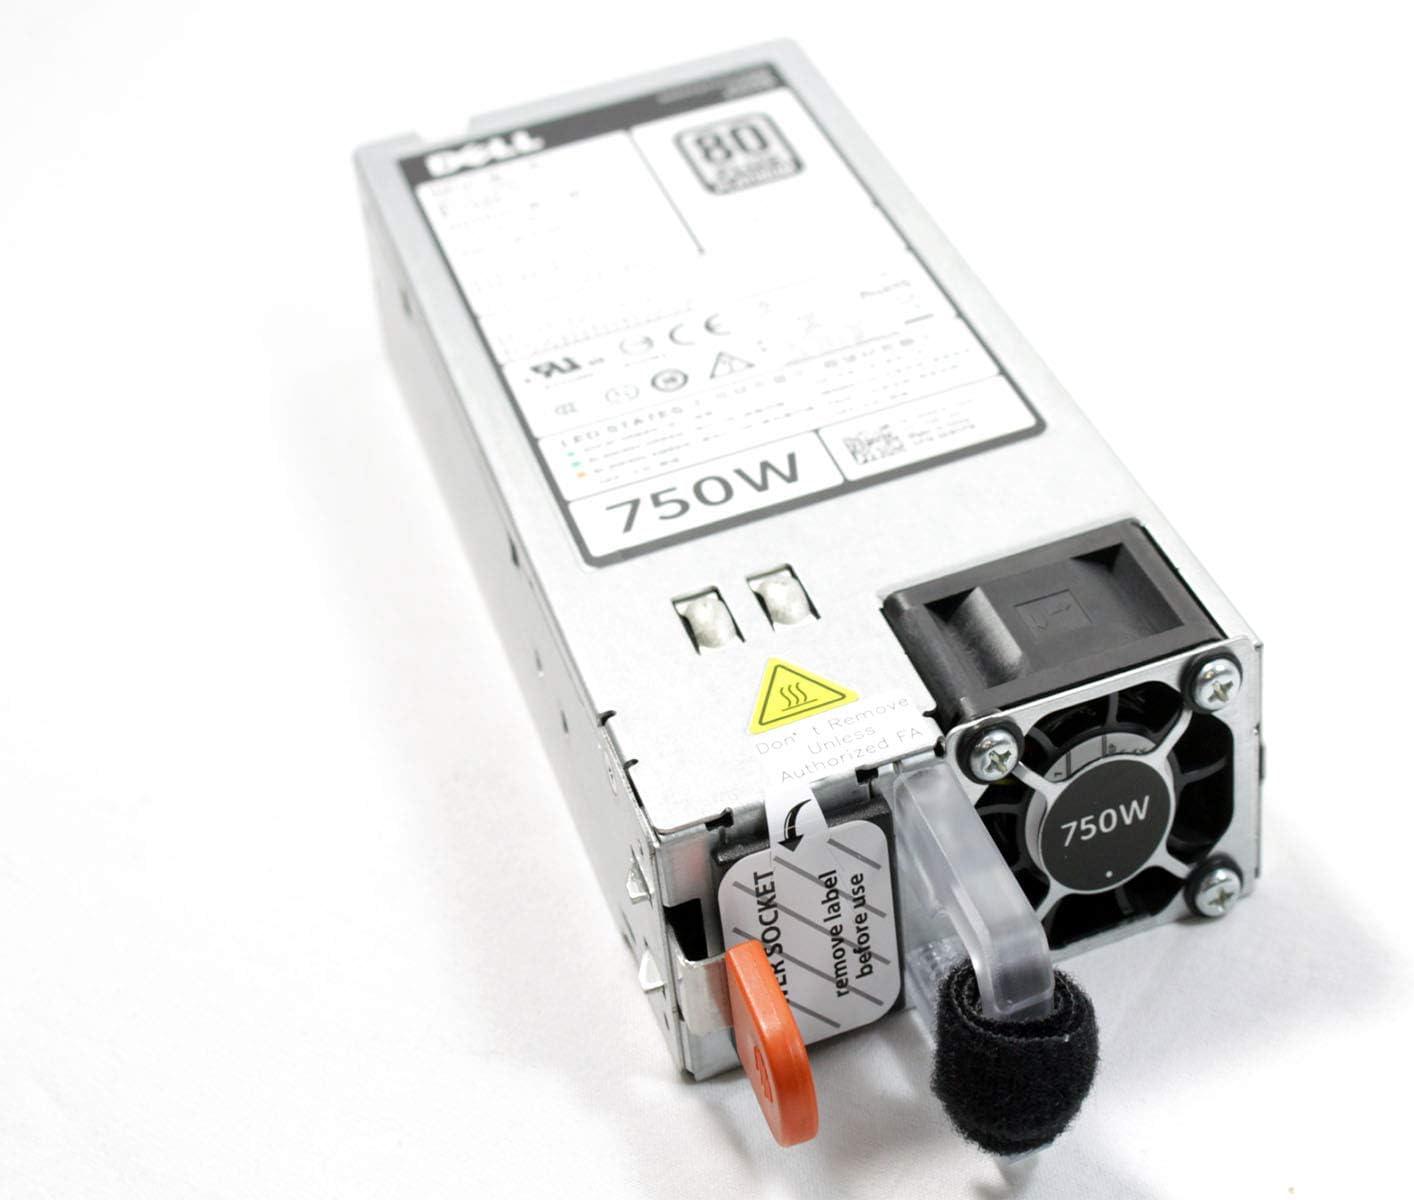 Dell 6W2PW 06W2PW 750W 80 Plus Platinum Hot Plug Power Supply Unit For Dell R520 R620 R720XD R820 T420 T320